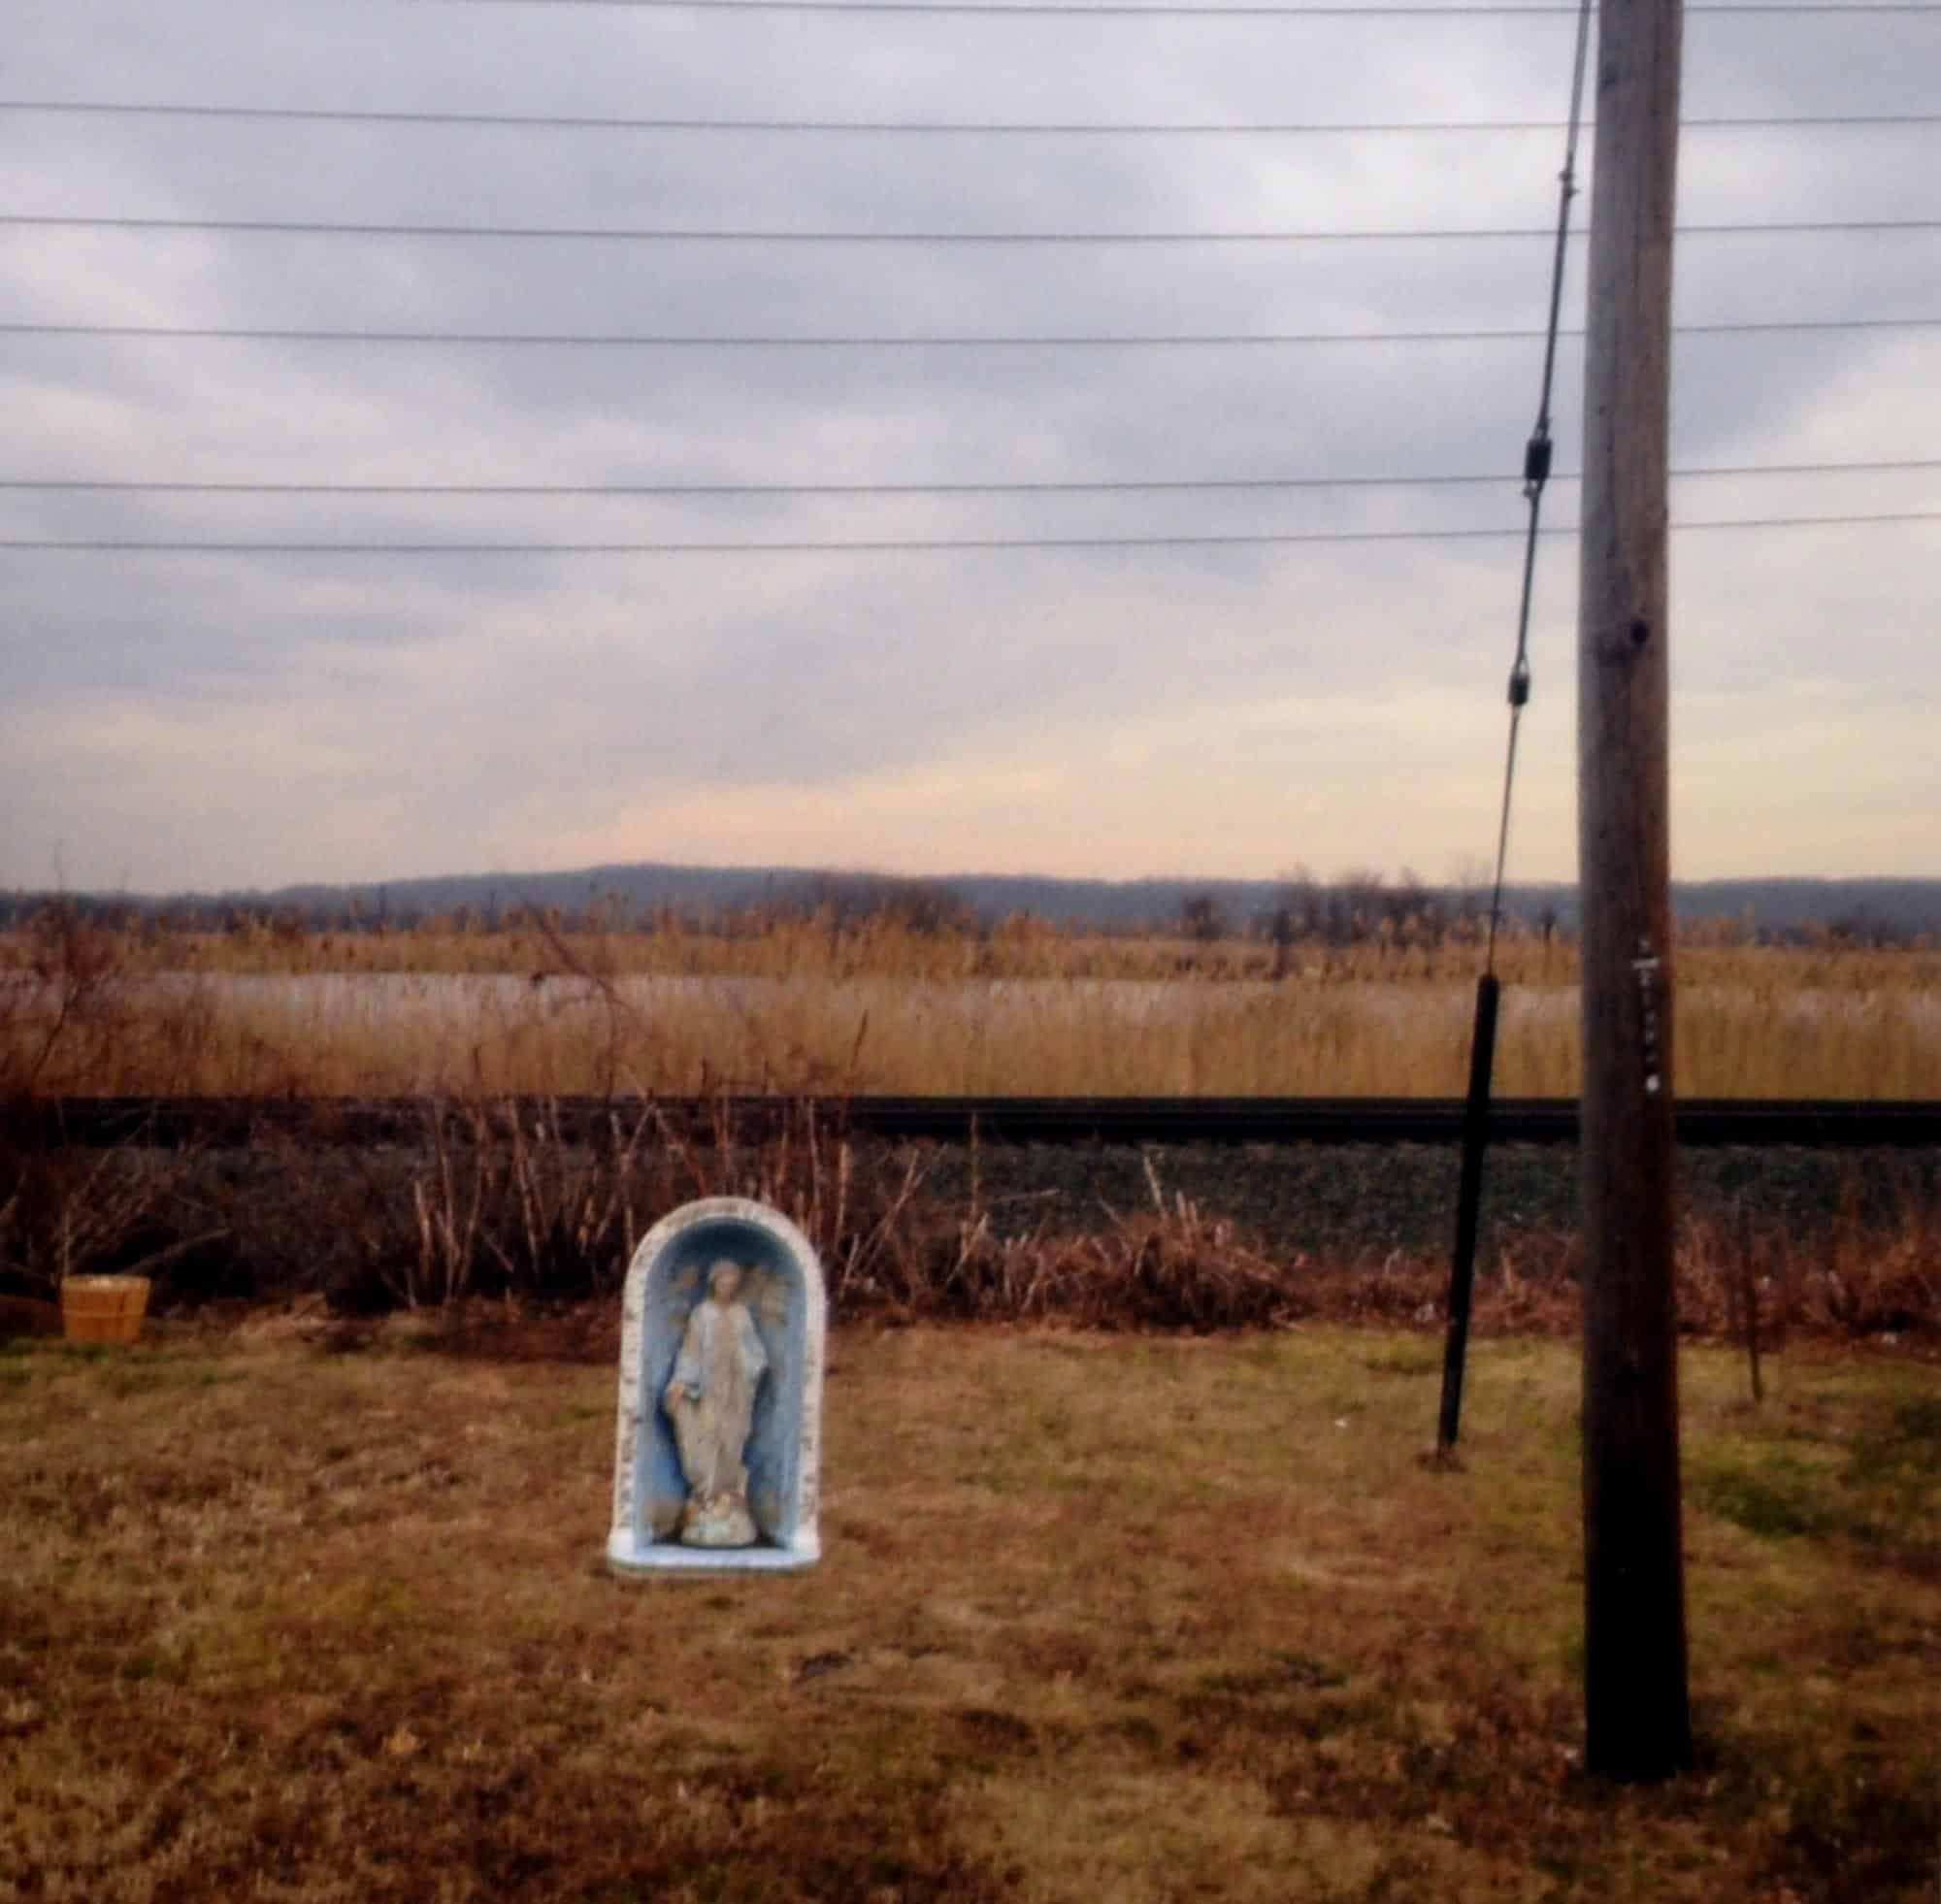 "David Coon, Bathtub Mary, 2015. Photography, 8 x 10""."